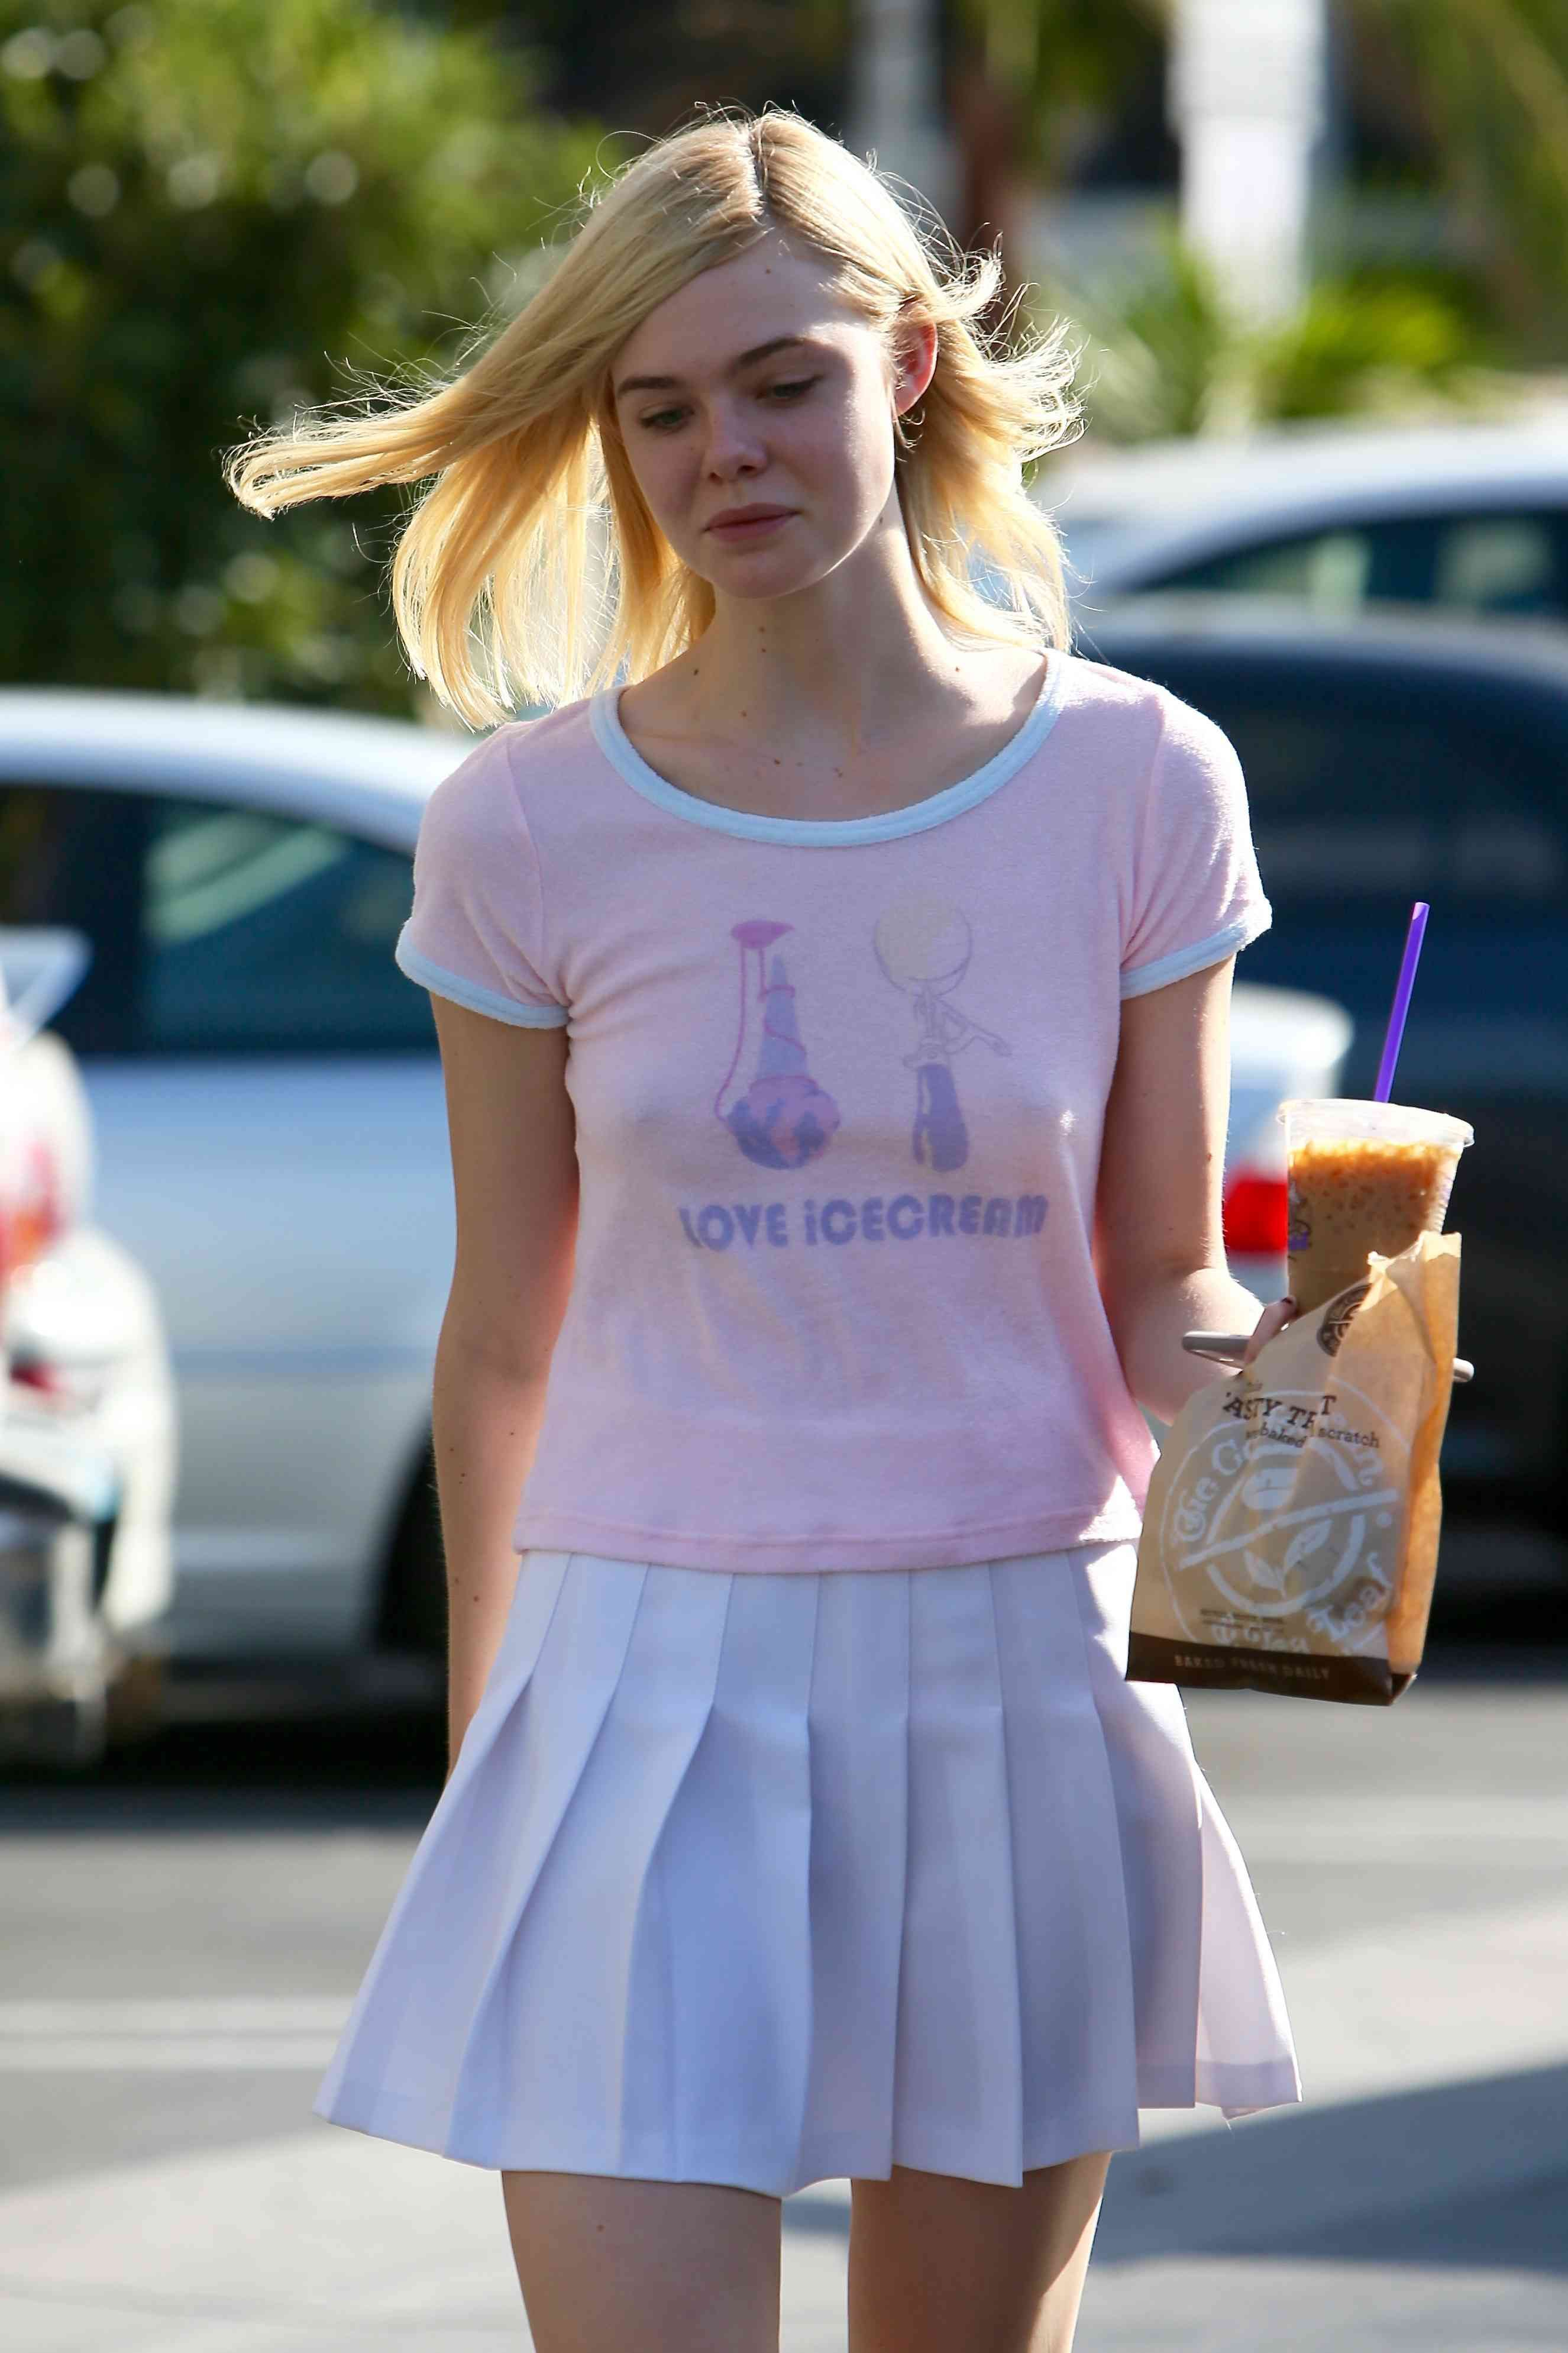 elle fanning instagram - Yahoo Image Search Results | Elle ...